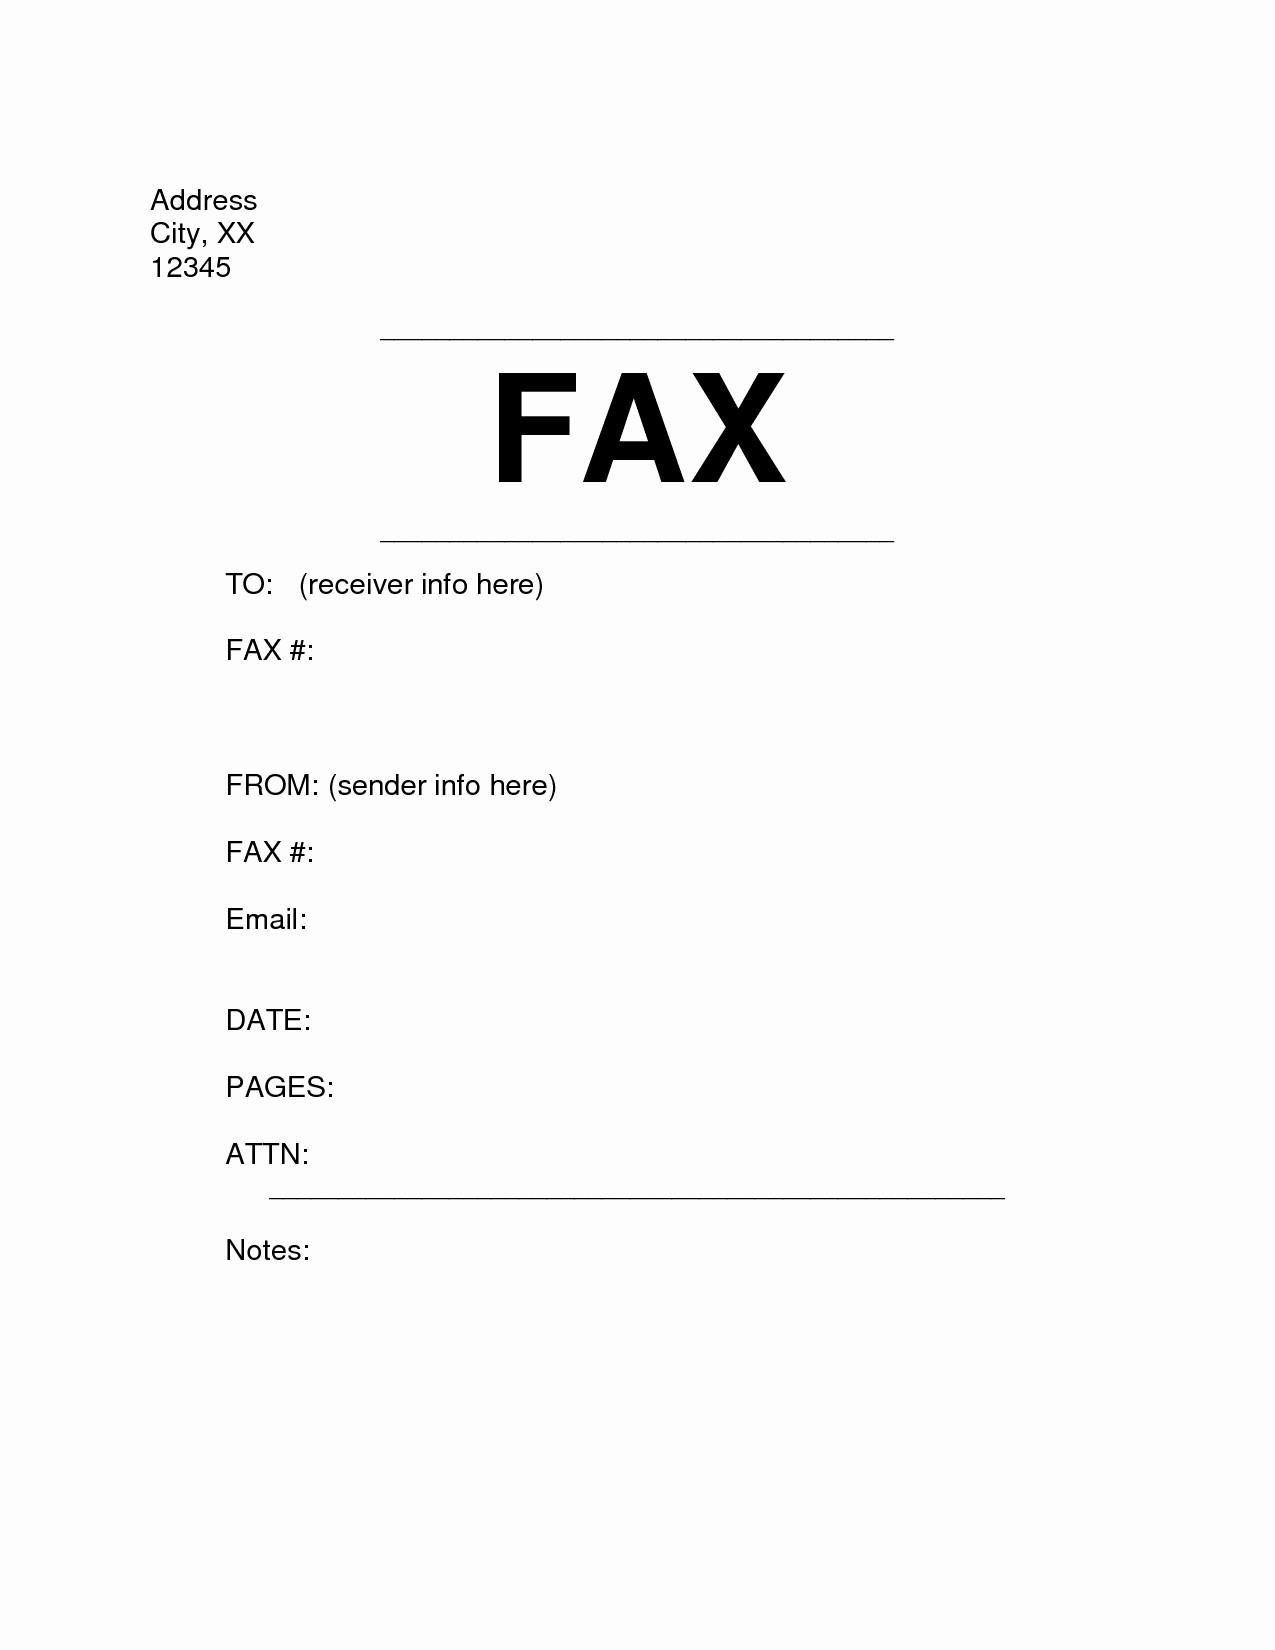 Personal Fax Cover Sheet Pdf Unique Microsoft Fice Fax Cover Sheet Template